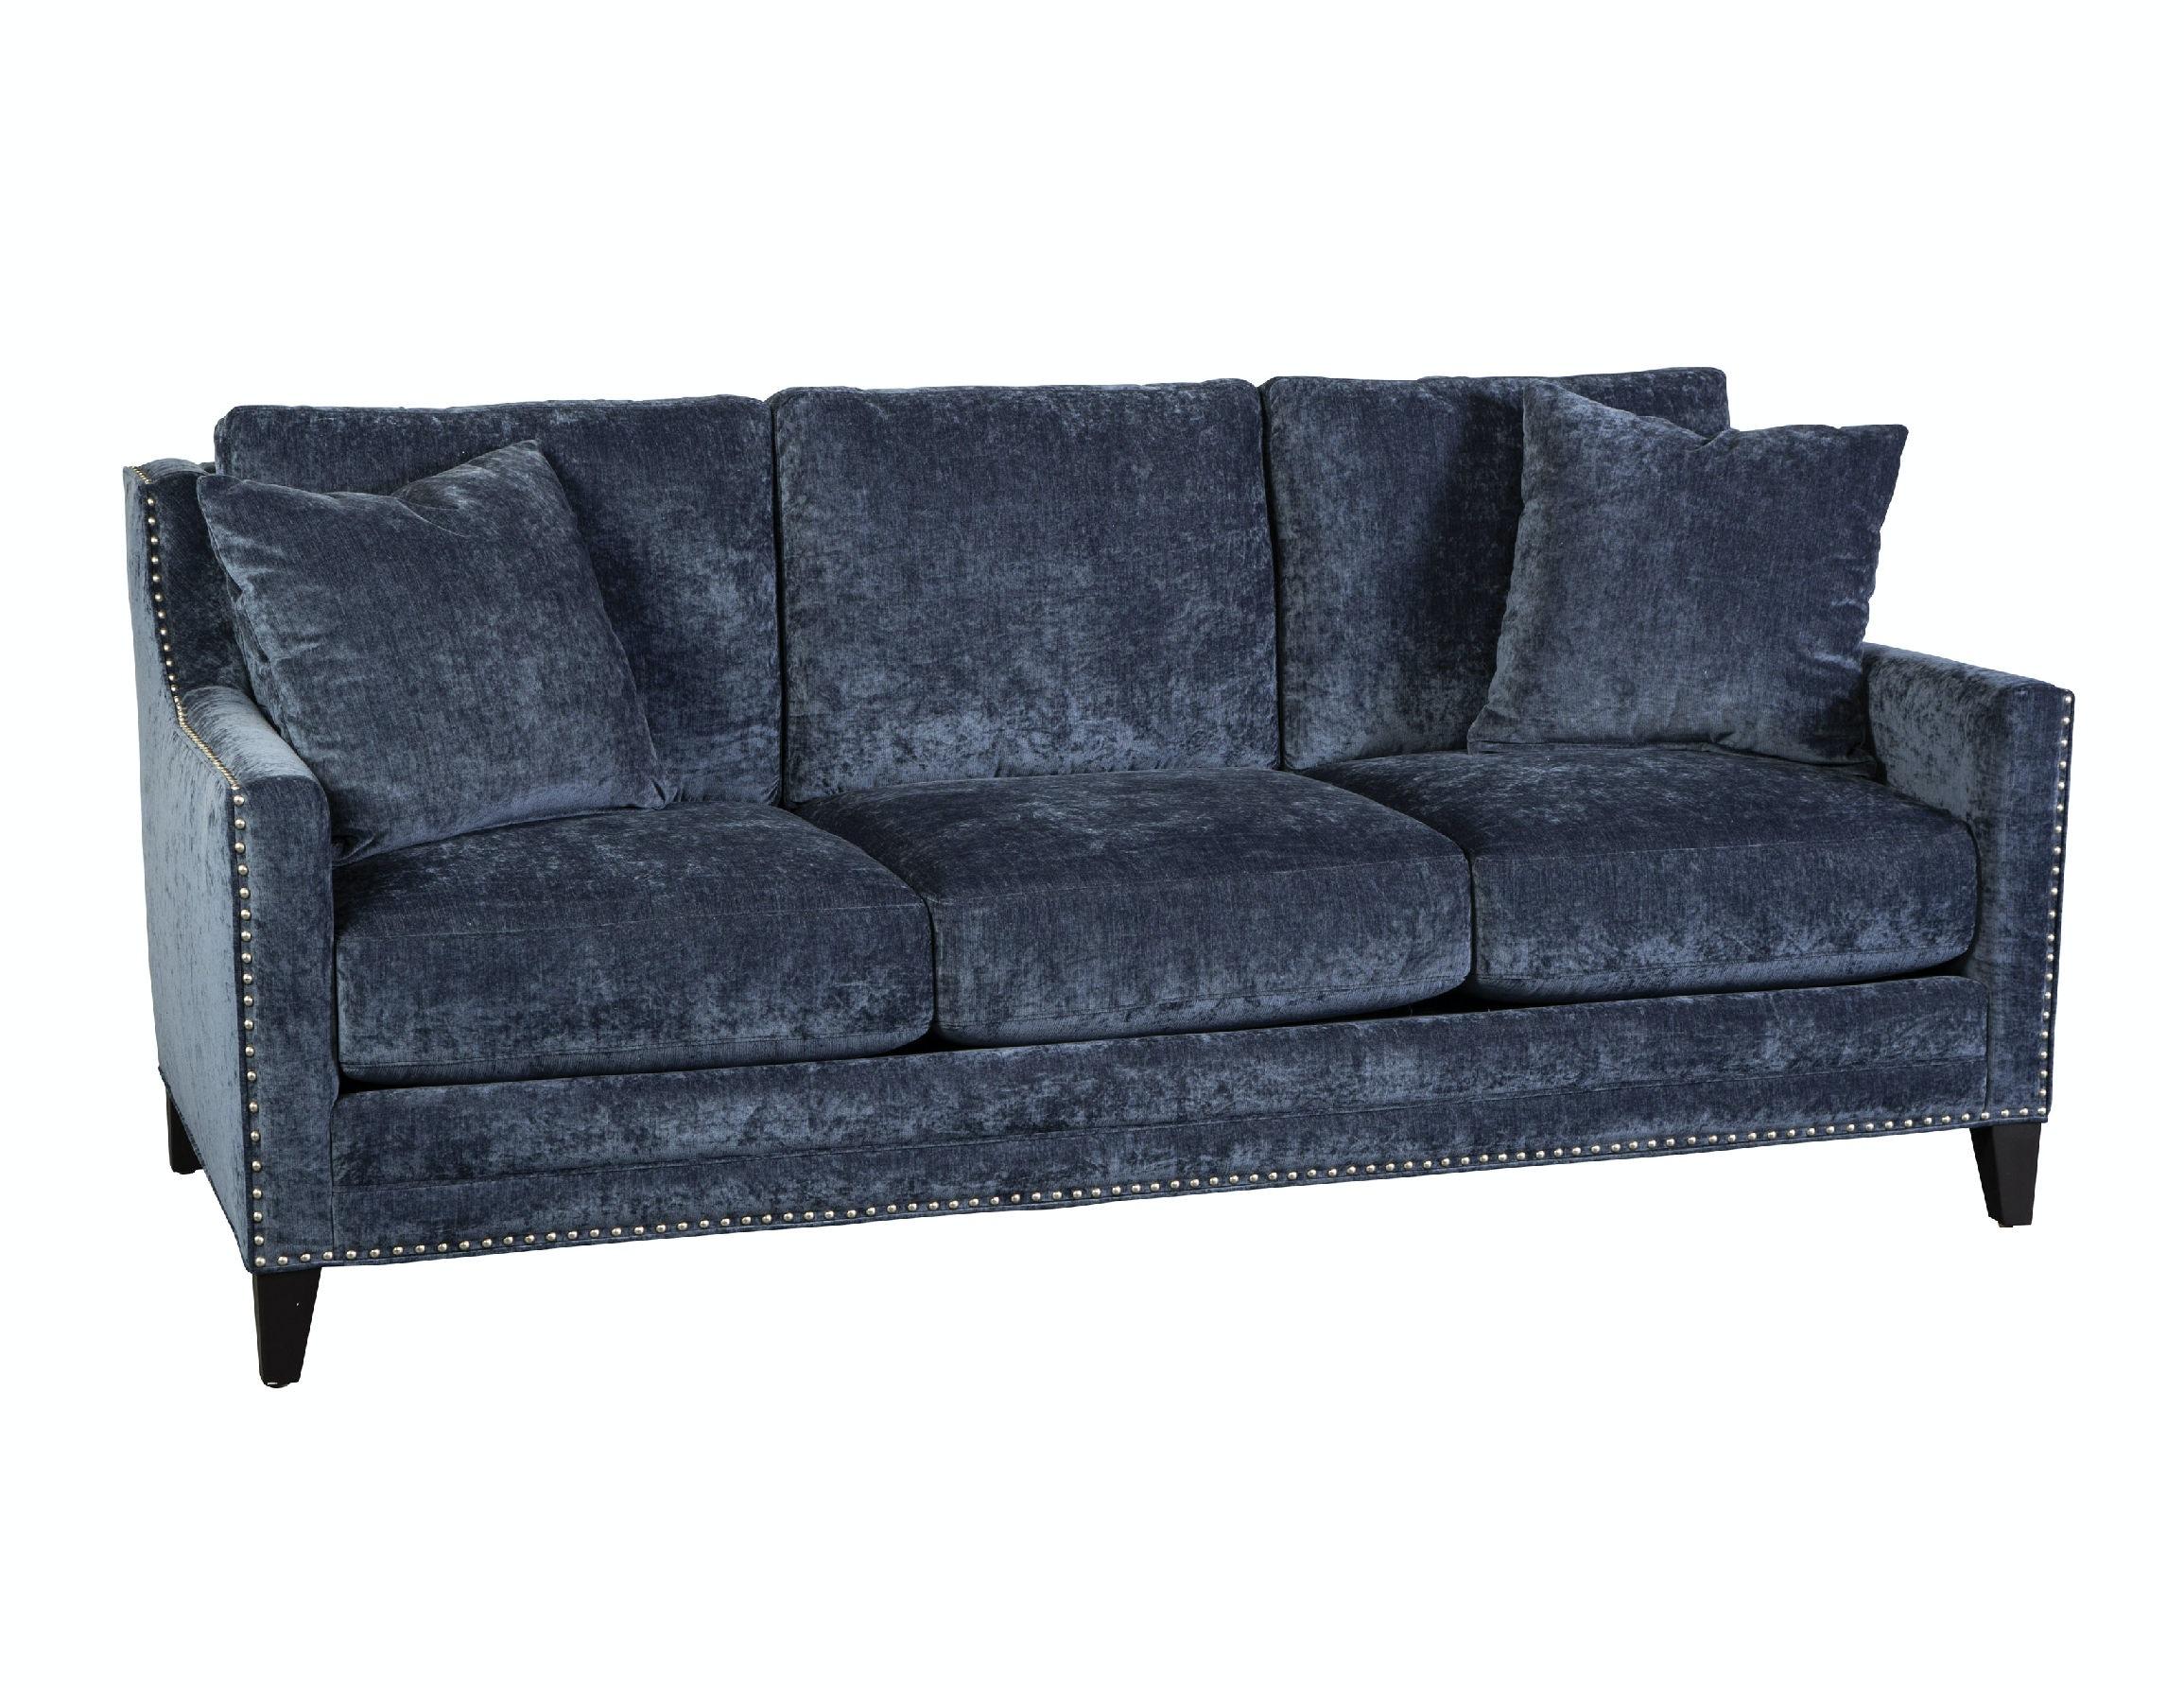 Ordinaire Jonathan Louis International Sofa 16730